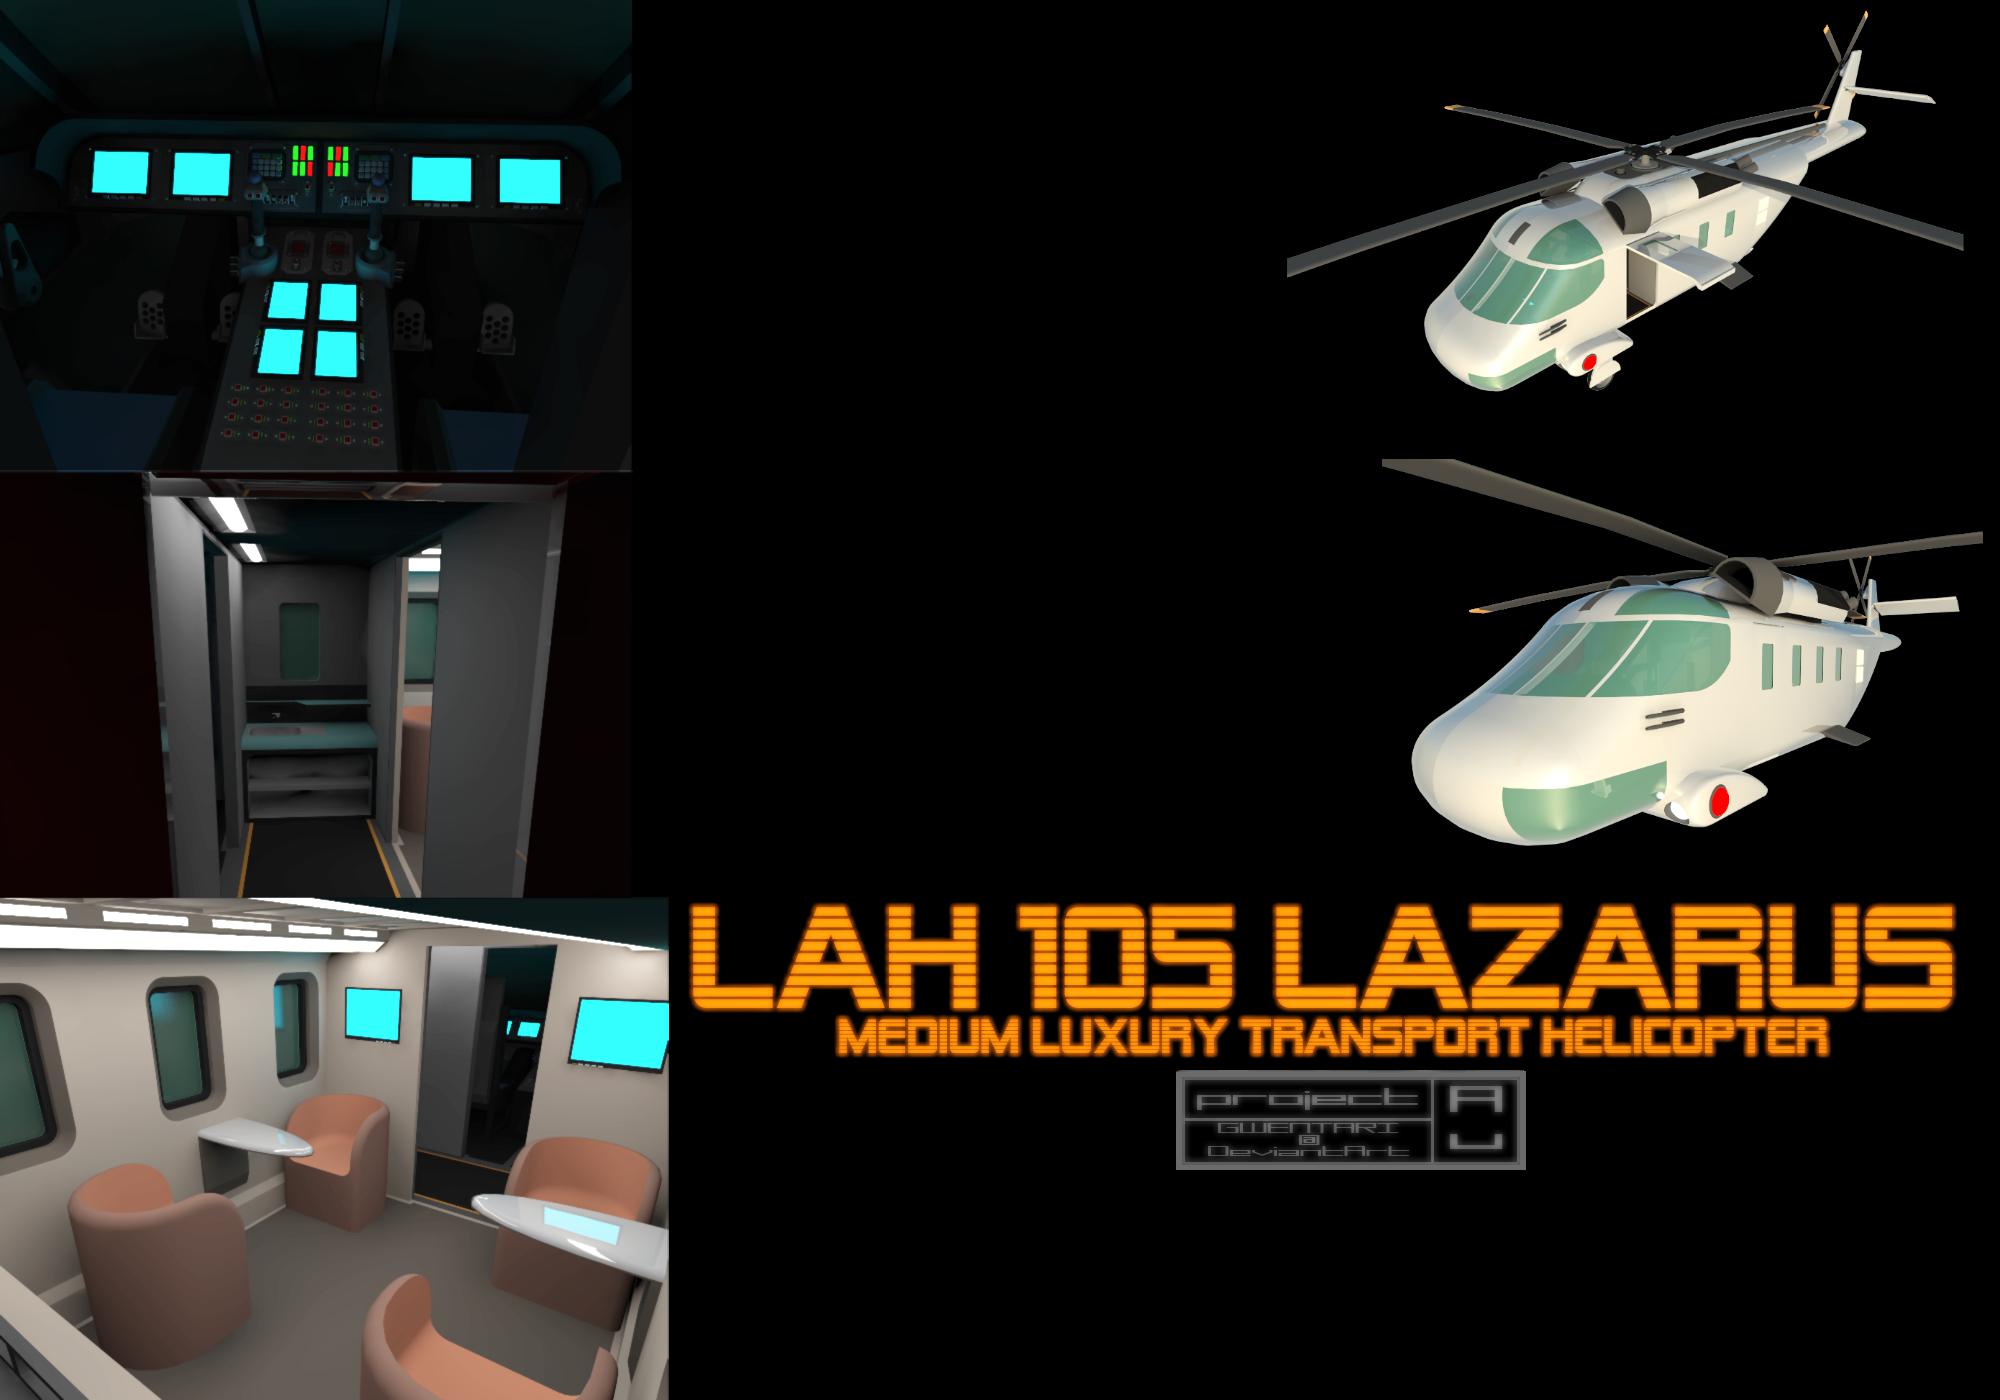 LAH 105 Lazarus Medium Helicopter by Gwentari